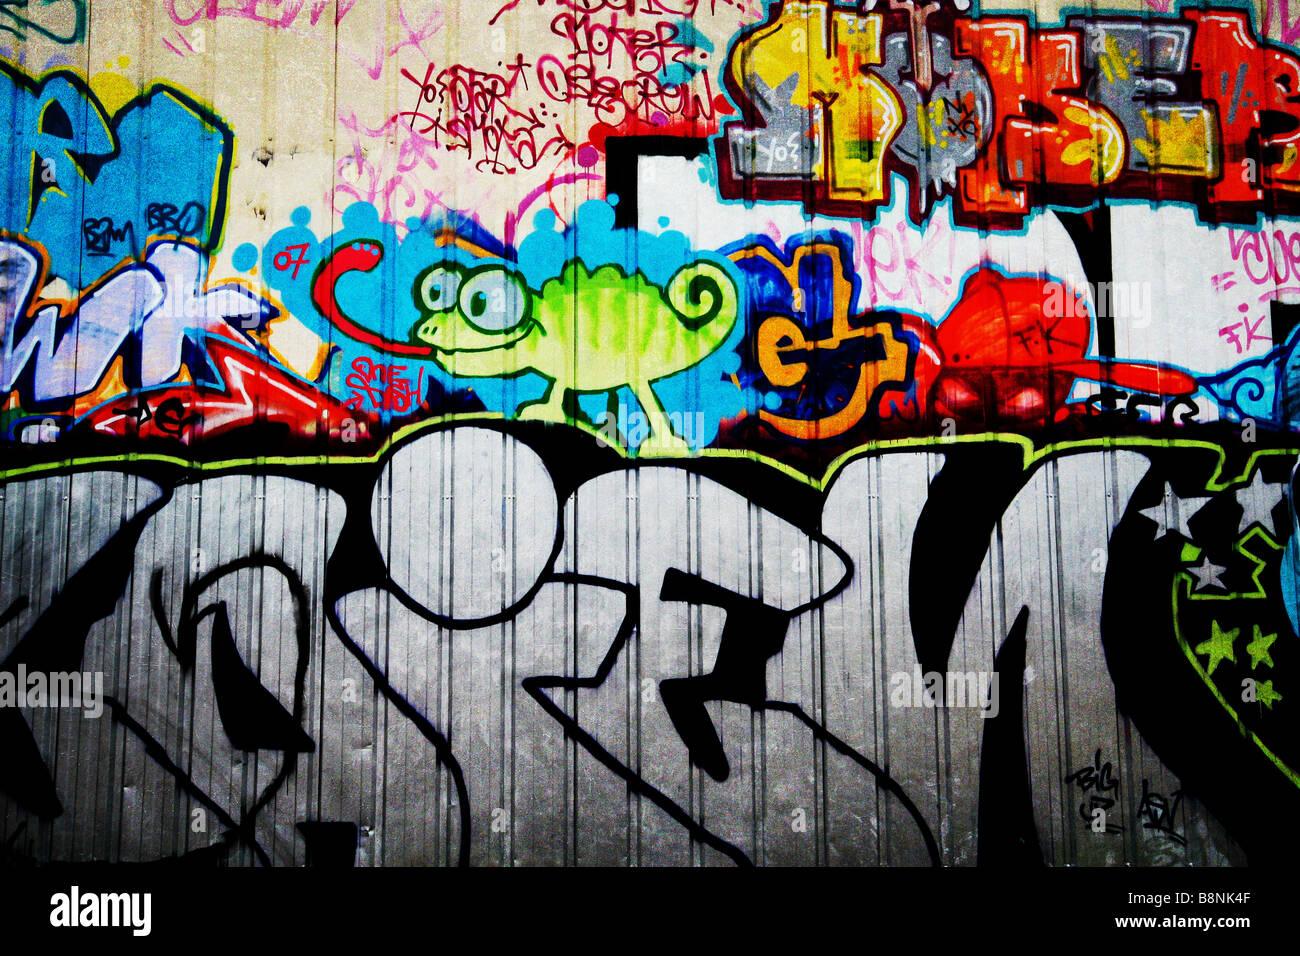 graffitti stock photos graffitti stock images alamy